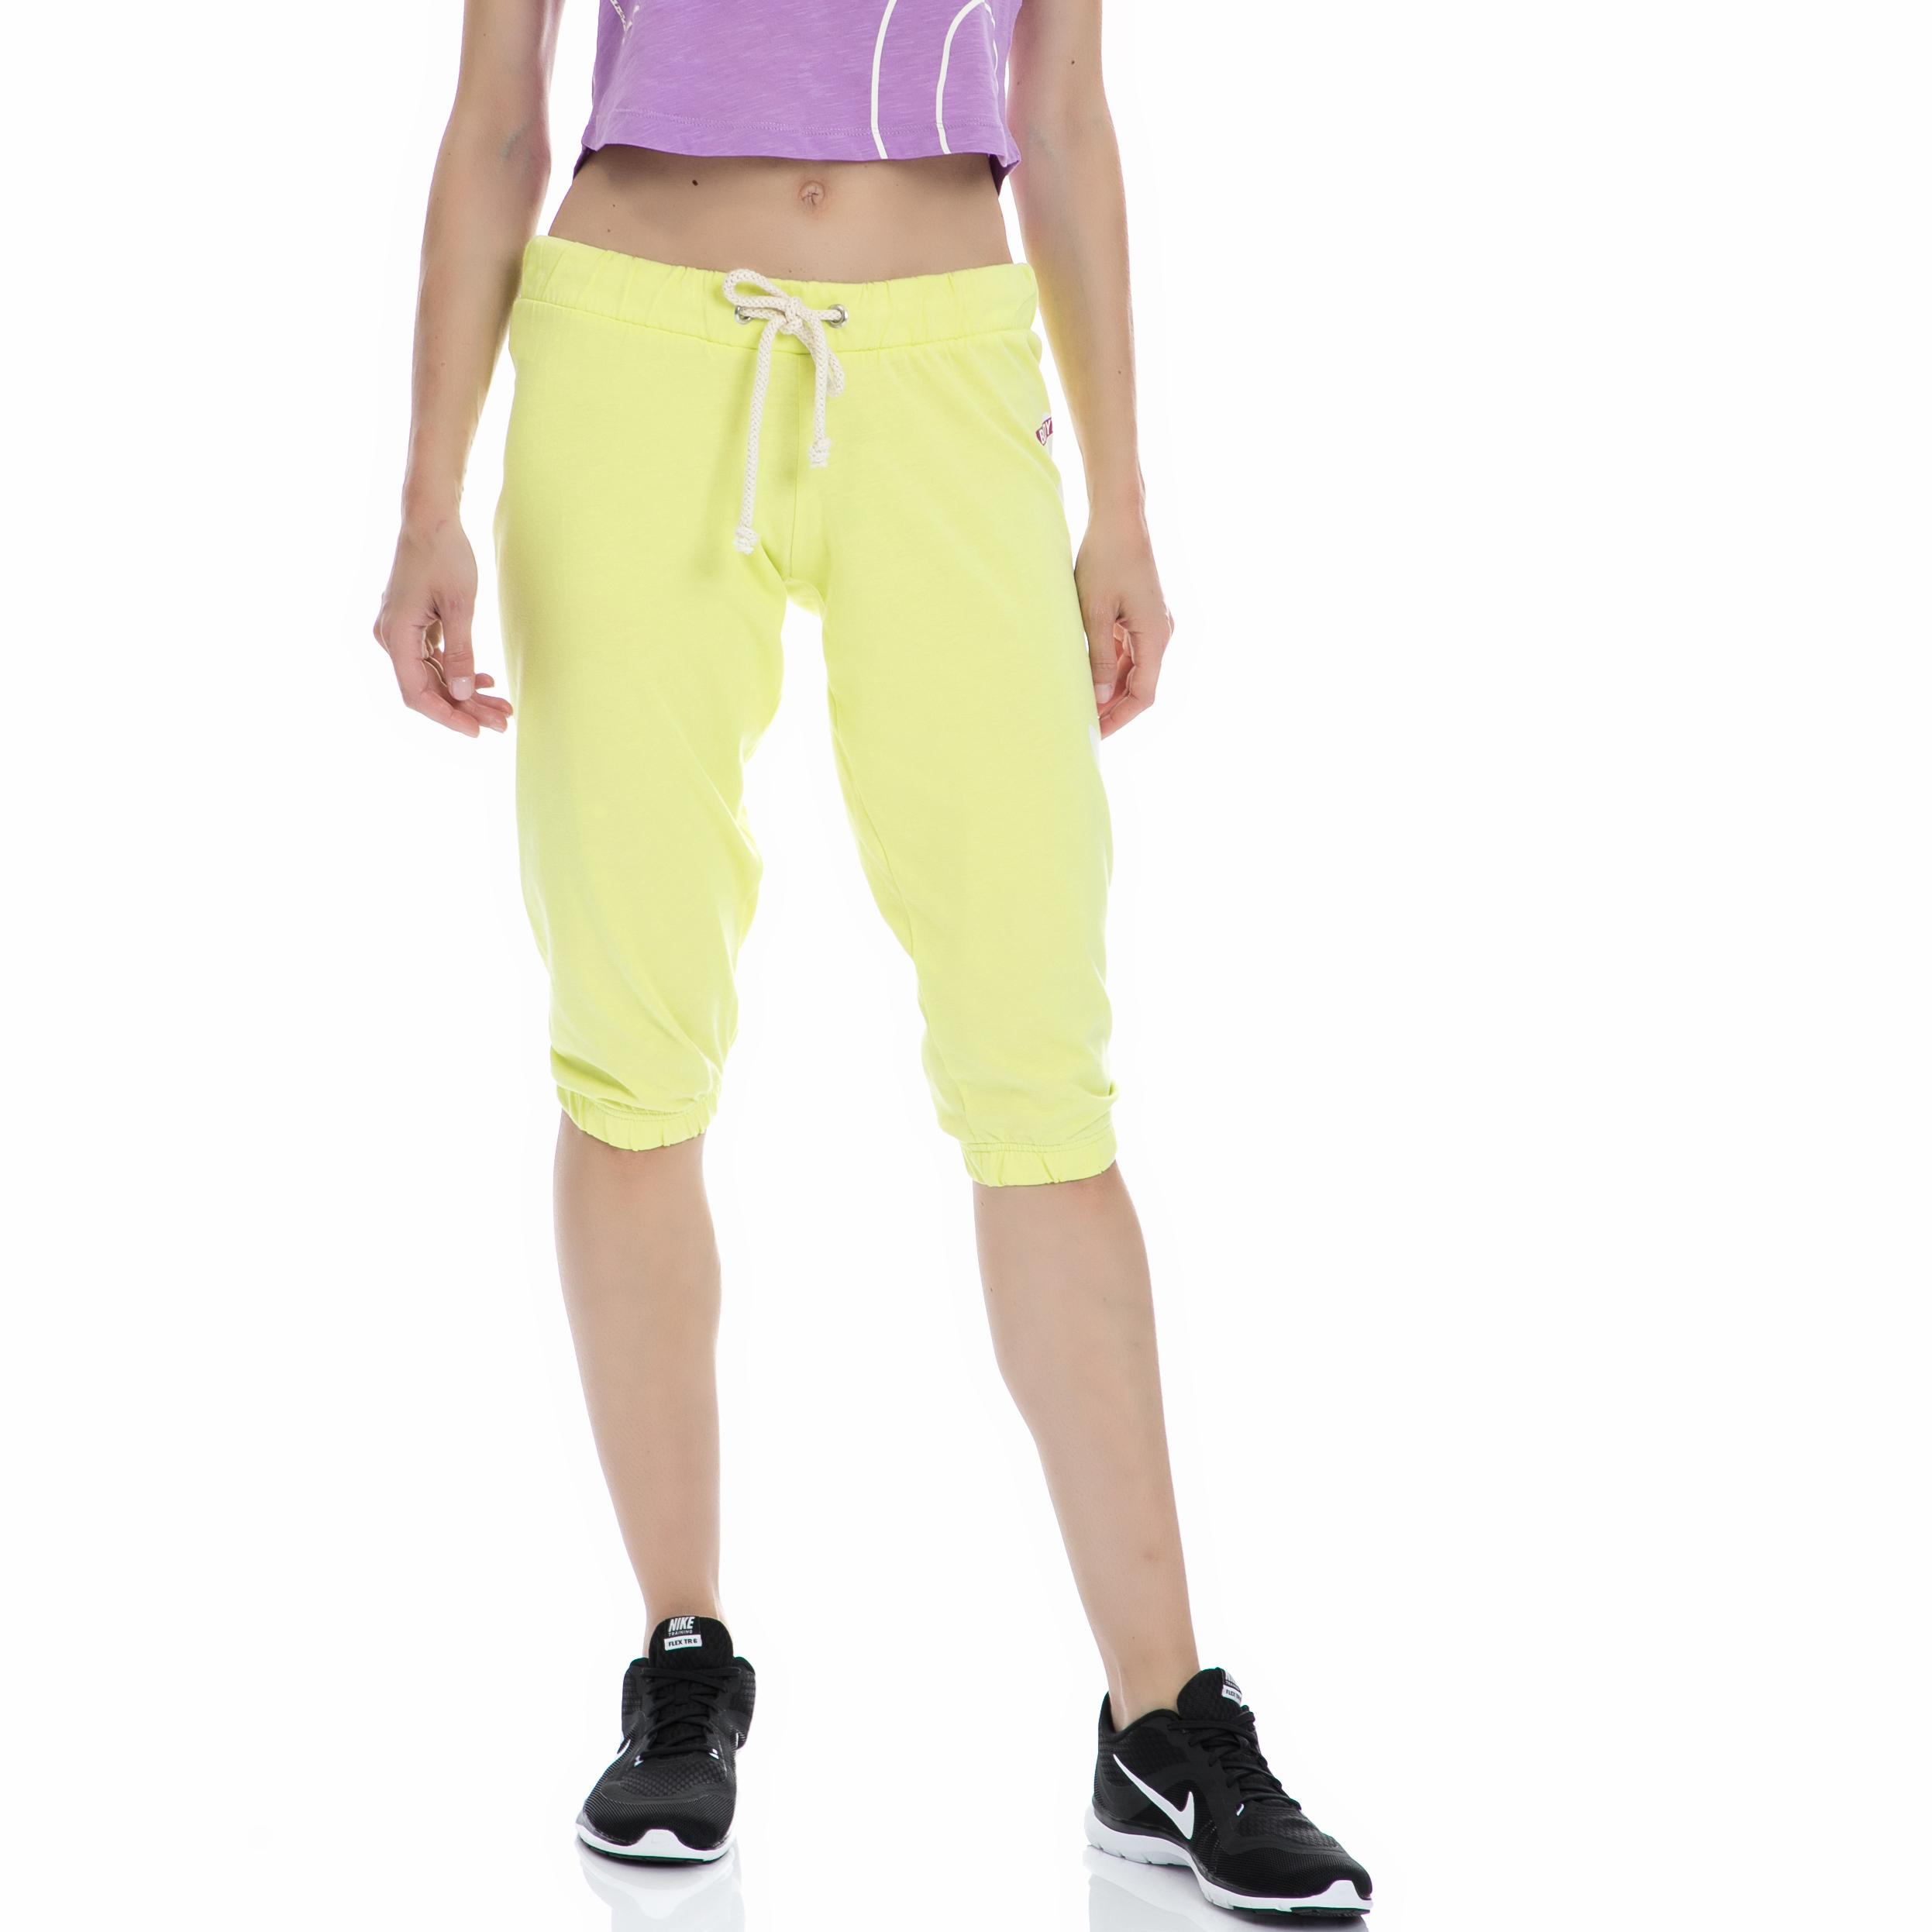 BODYTALK - Γυναικεία φόρμα BODYTALK πράσινη-κίτρινη γυναικεία ρούχα αθλητικά φόρμες